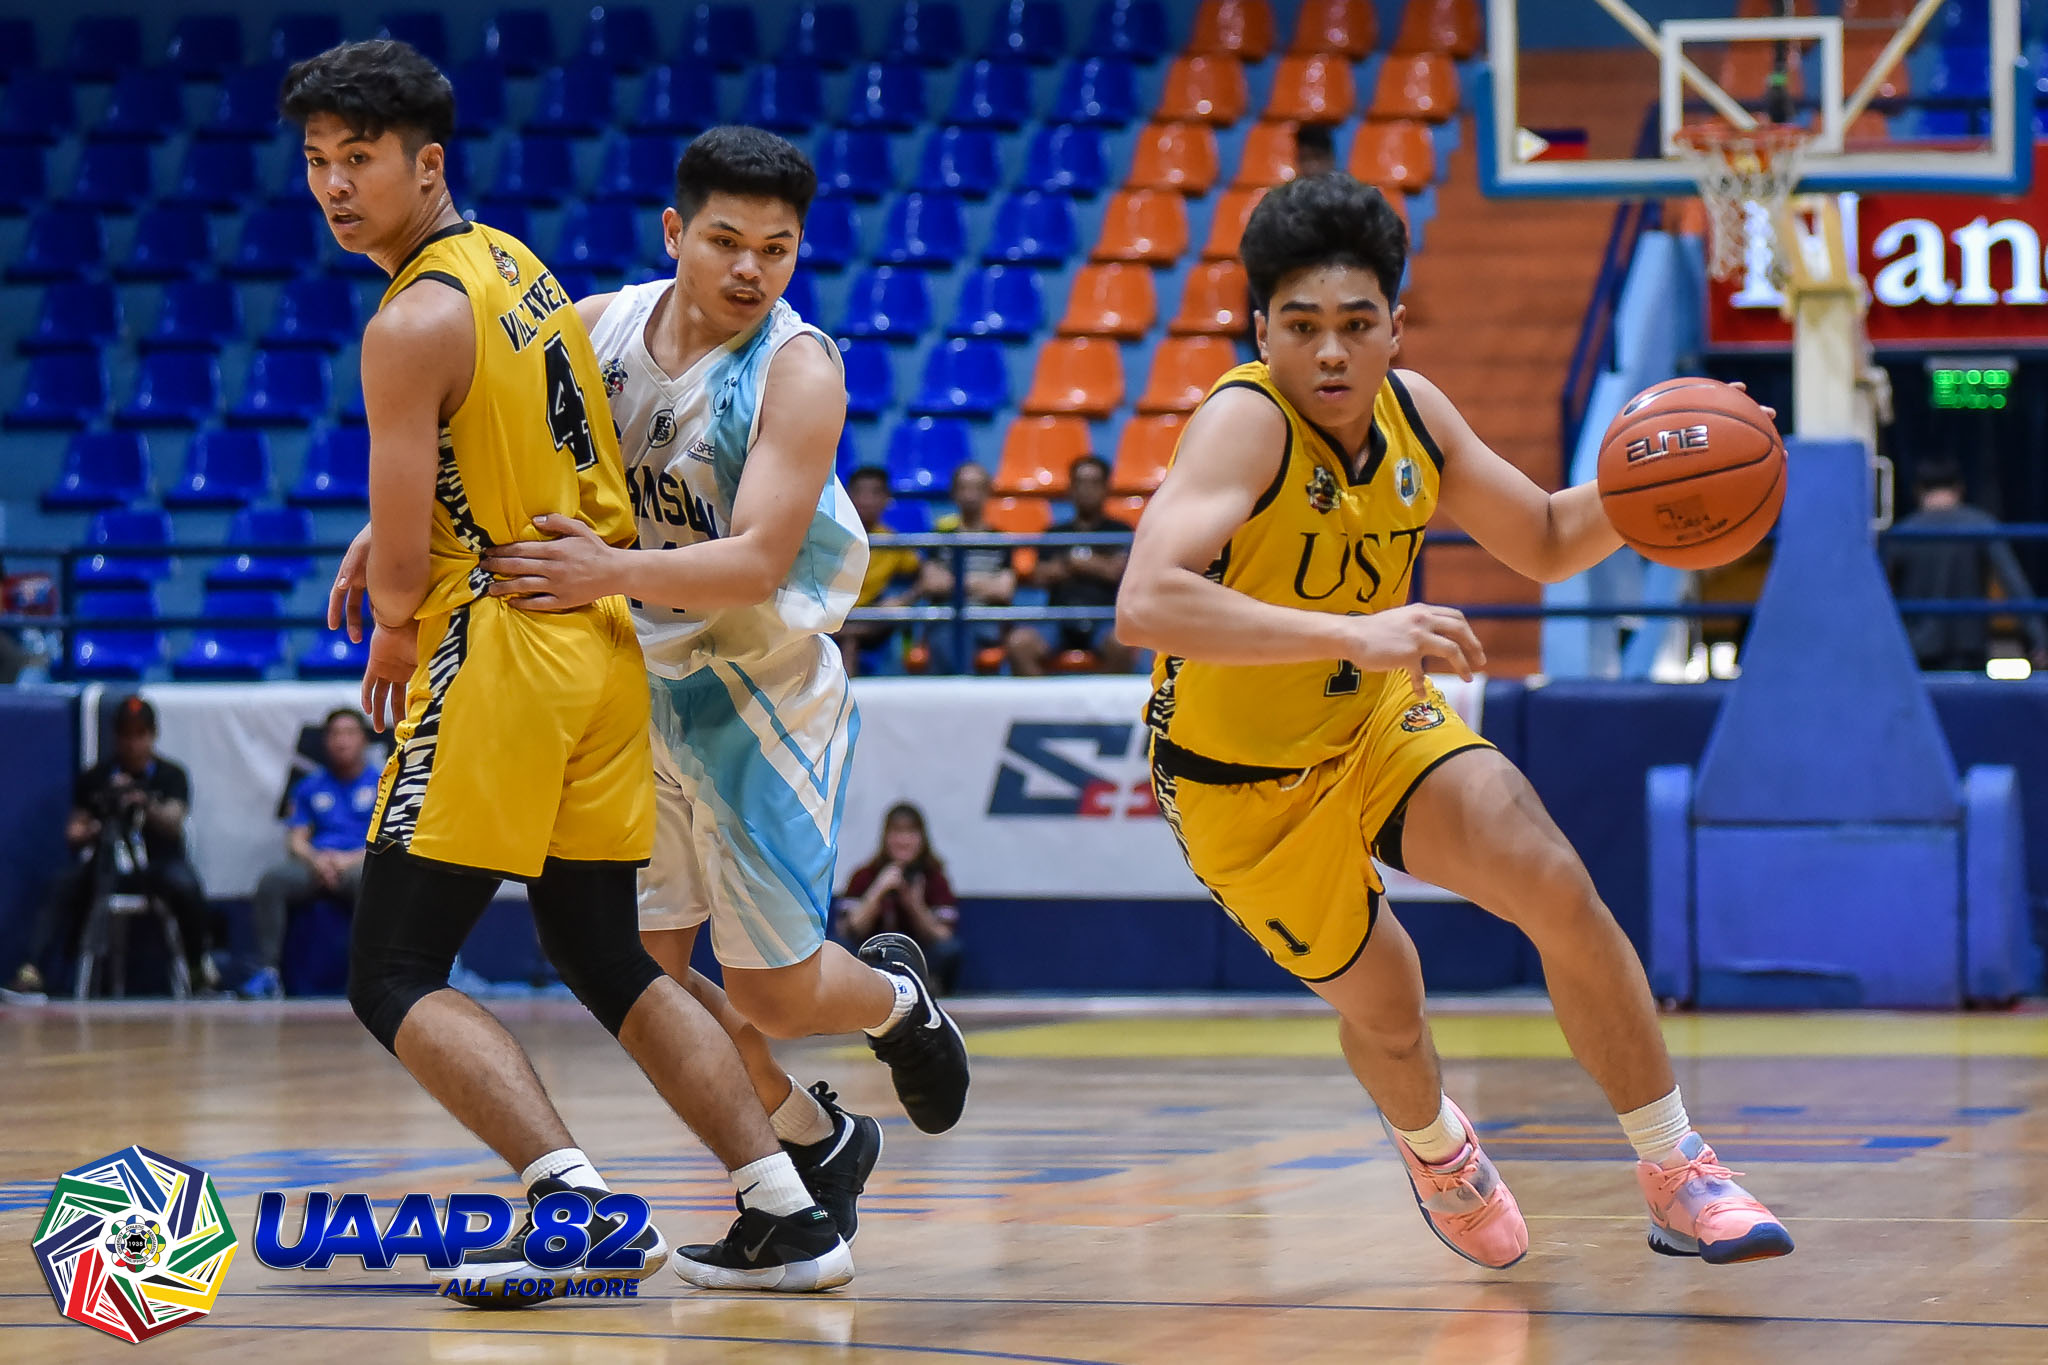 UAAP-82-Jrs-UST-vs.-ADU-Cortez-3633 UST's Jacob Cortez commits to San Beda Basketball NCAA News SBC UAAP UST  - philippine sports news